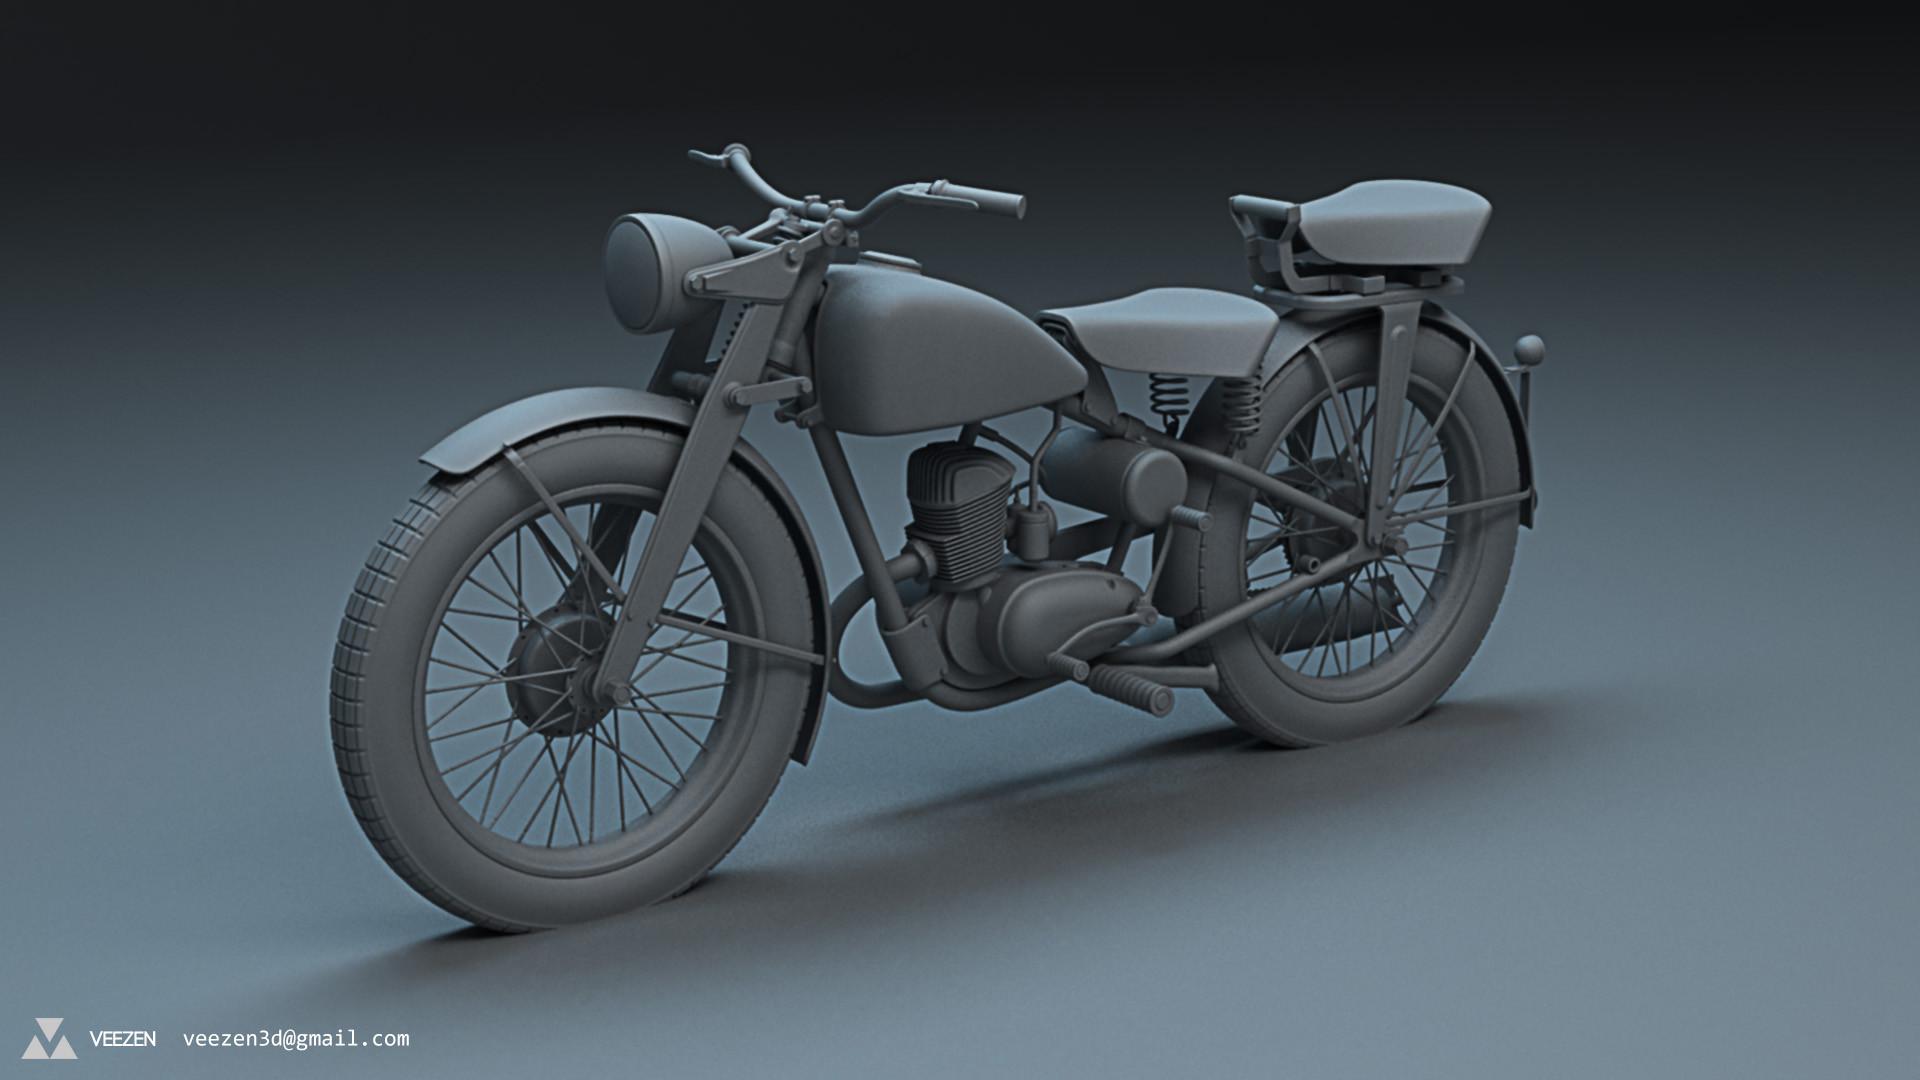 Michal veezen kalisz sokolbike hp 01